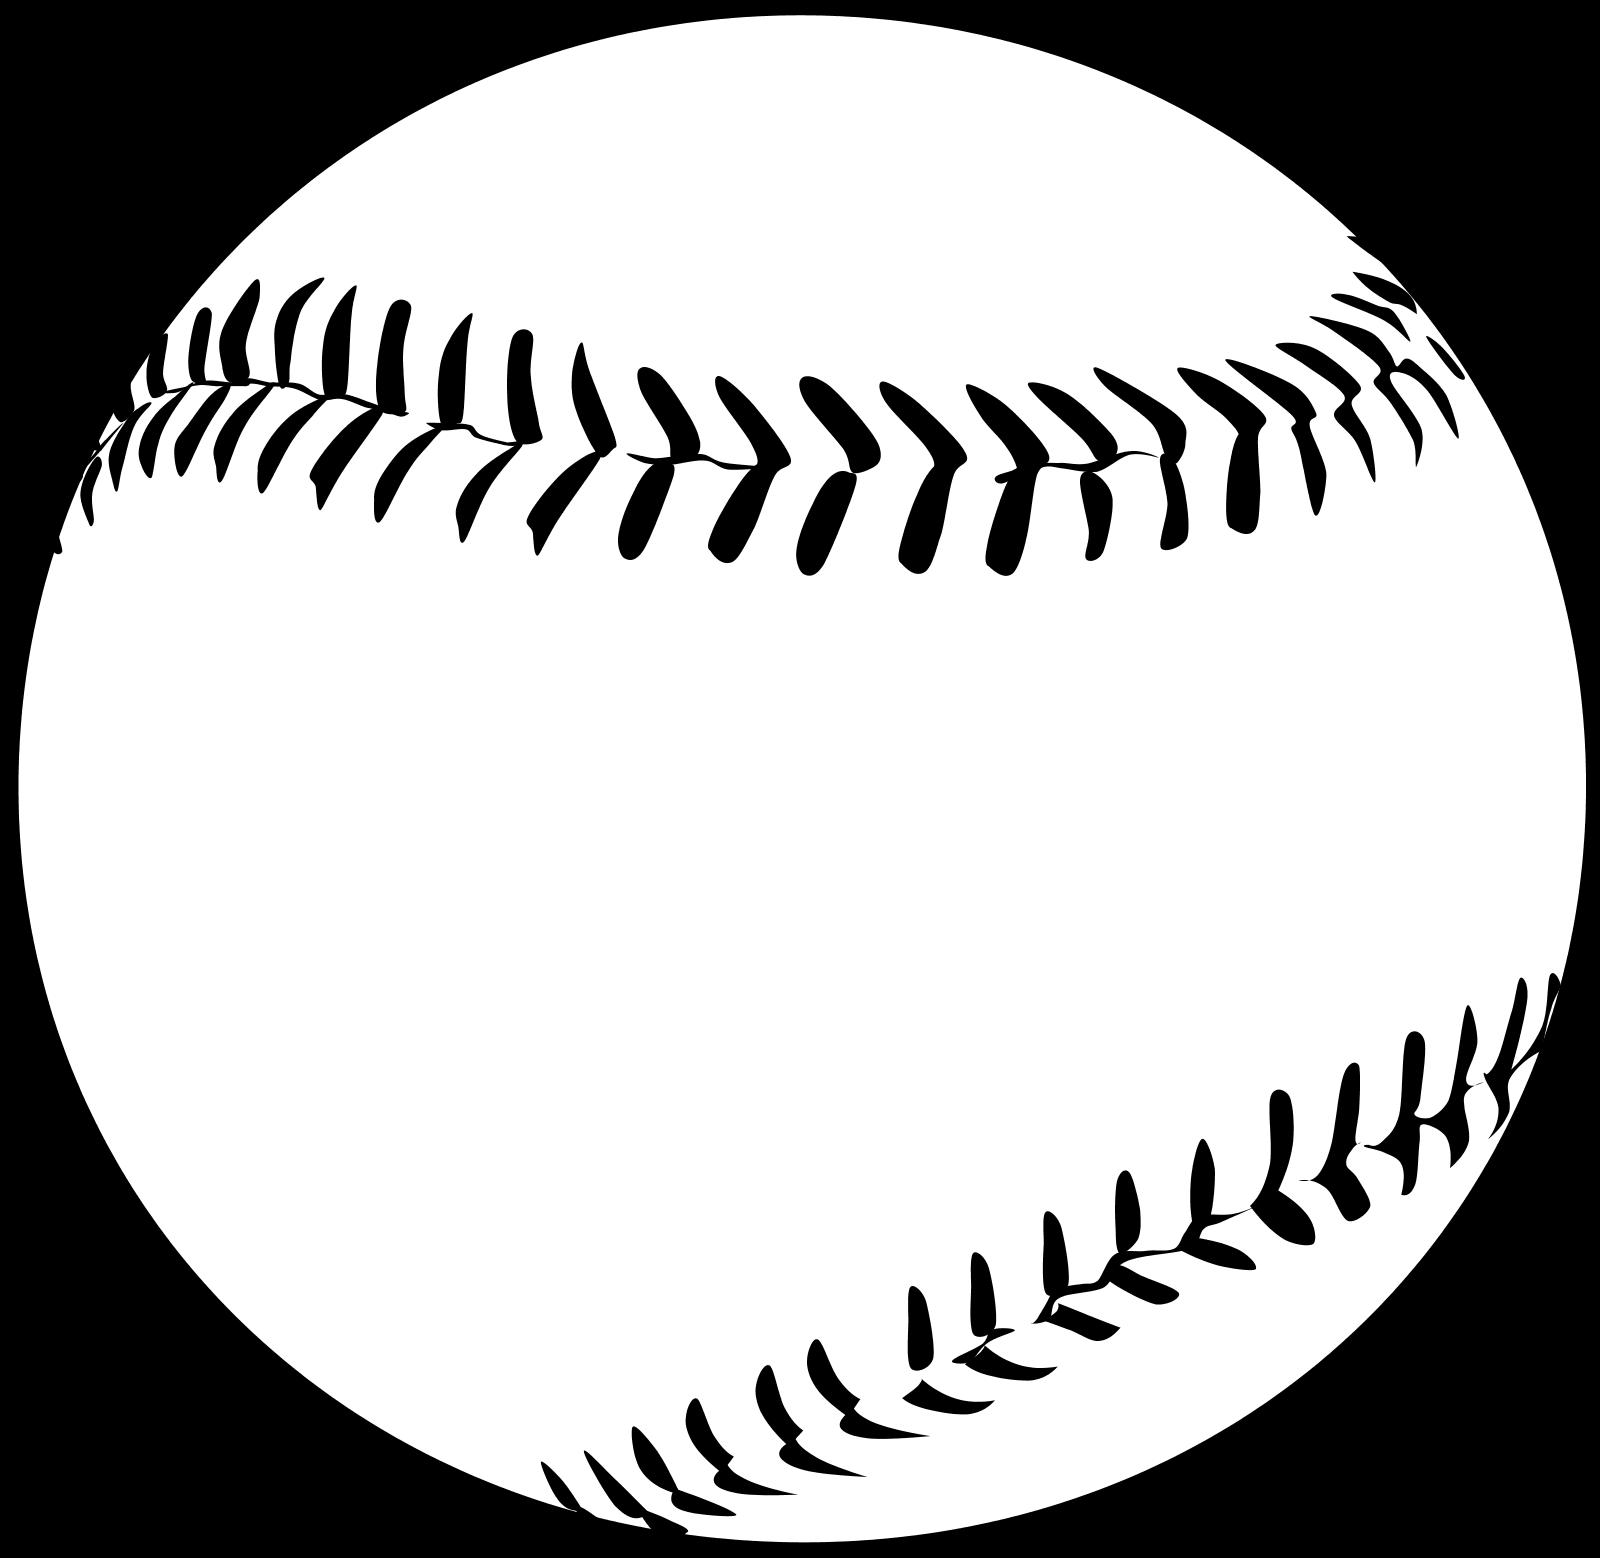 Baseball diamond baseball field clip art clipart